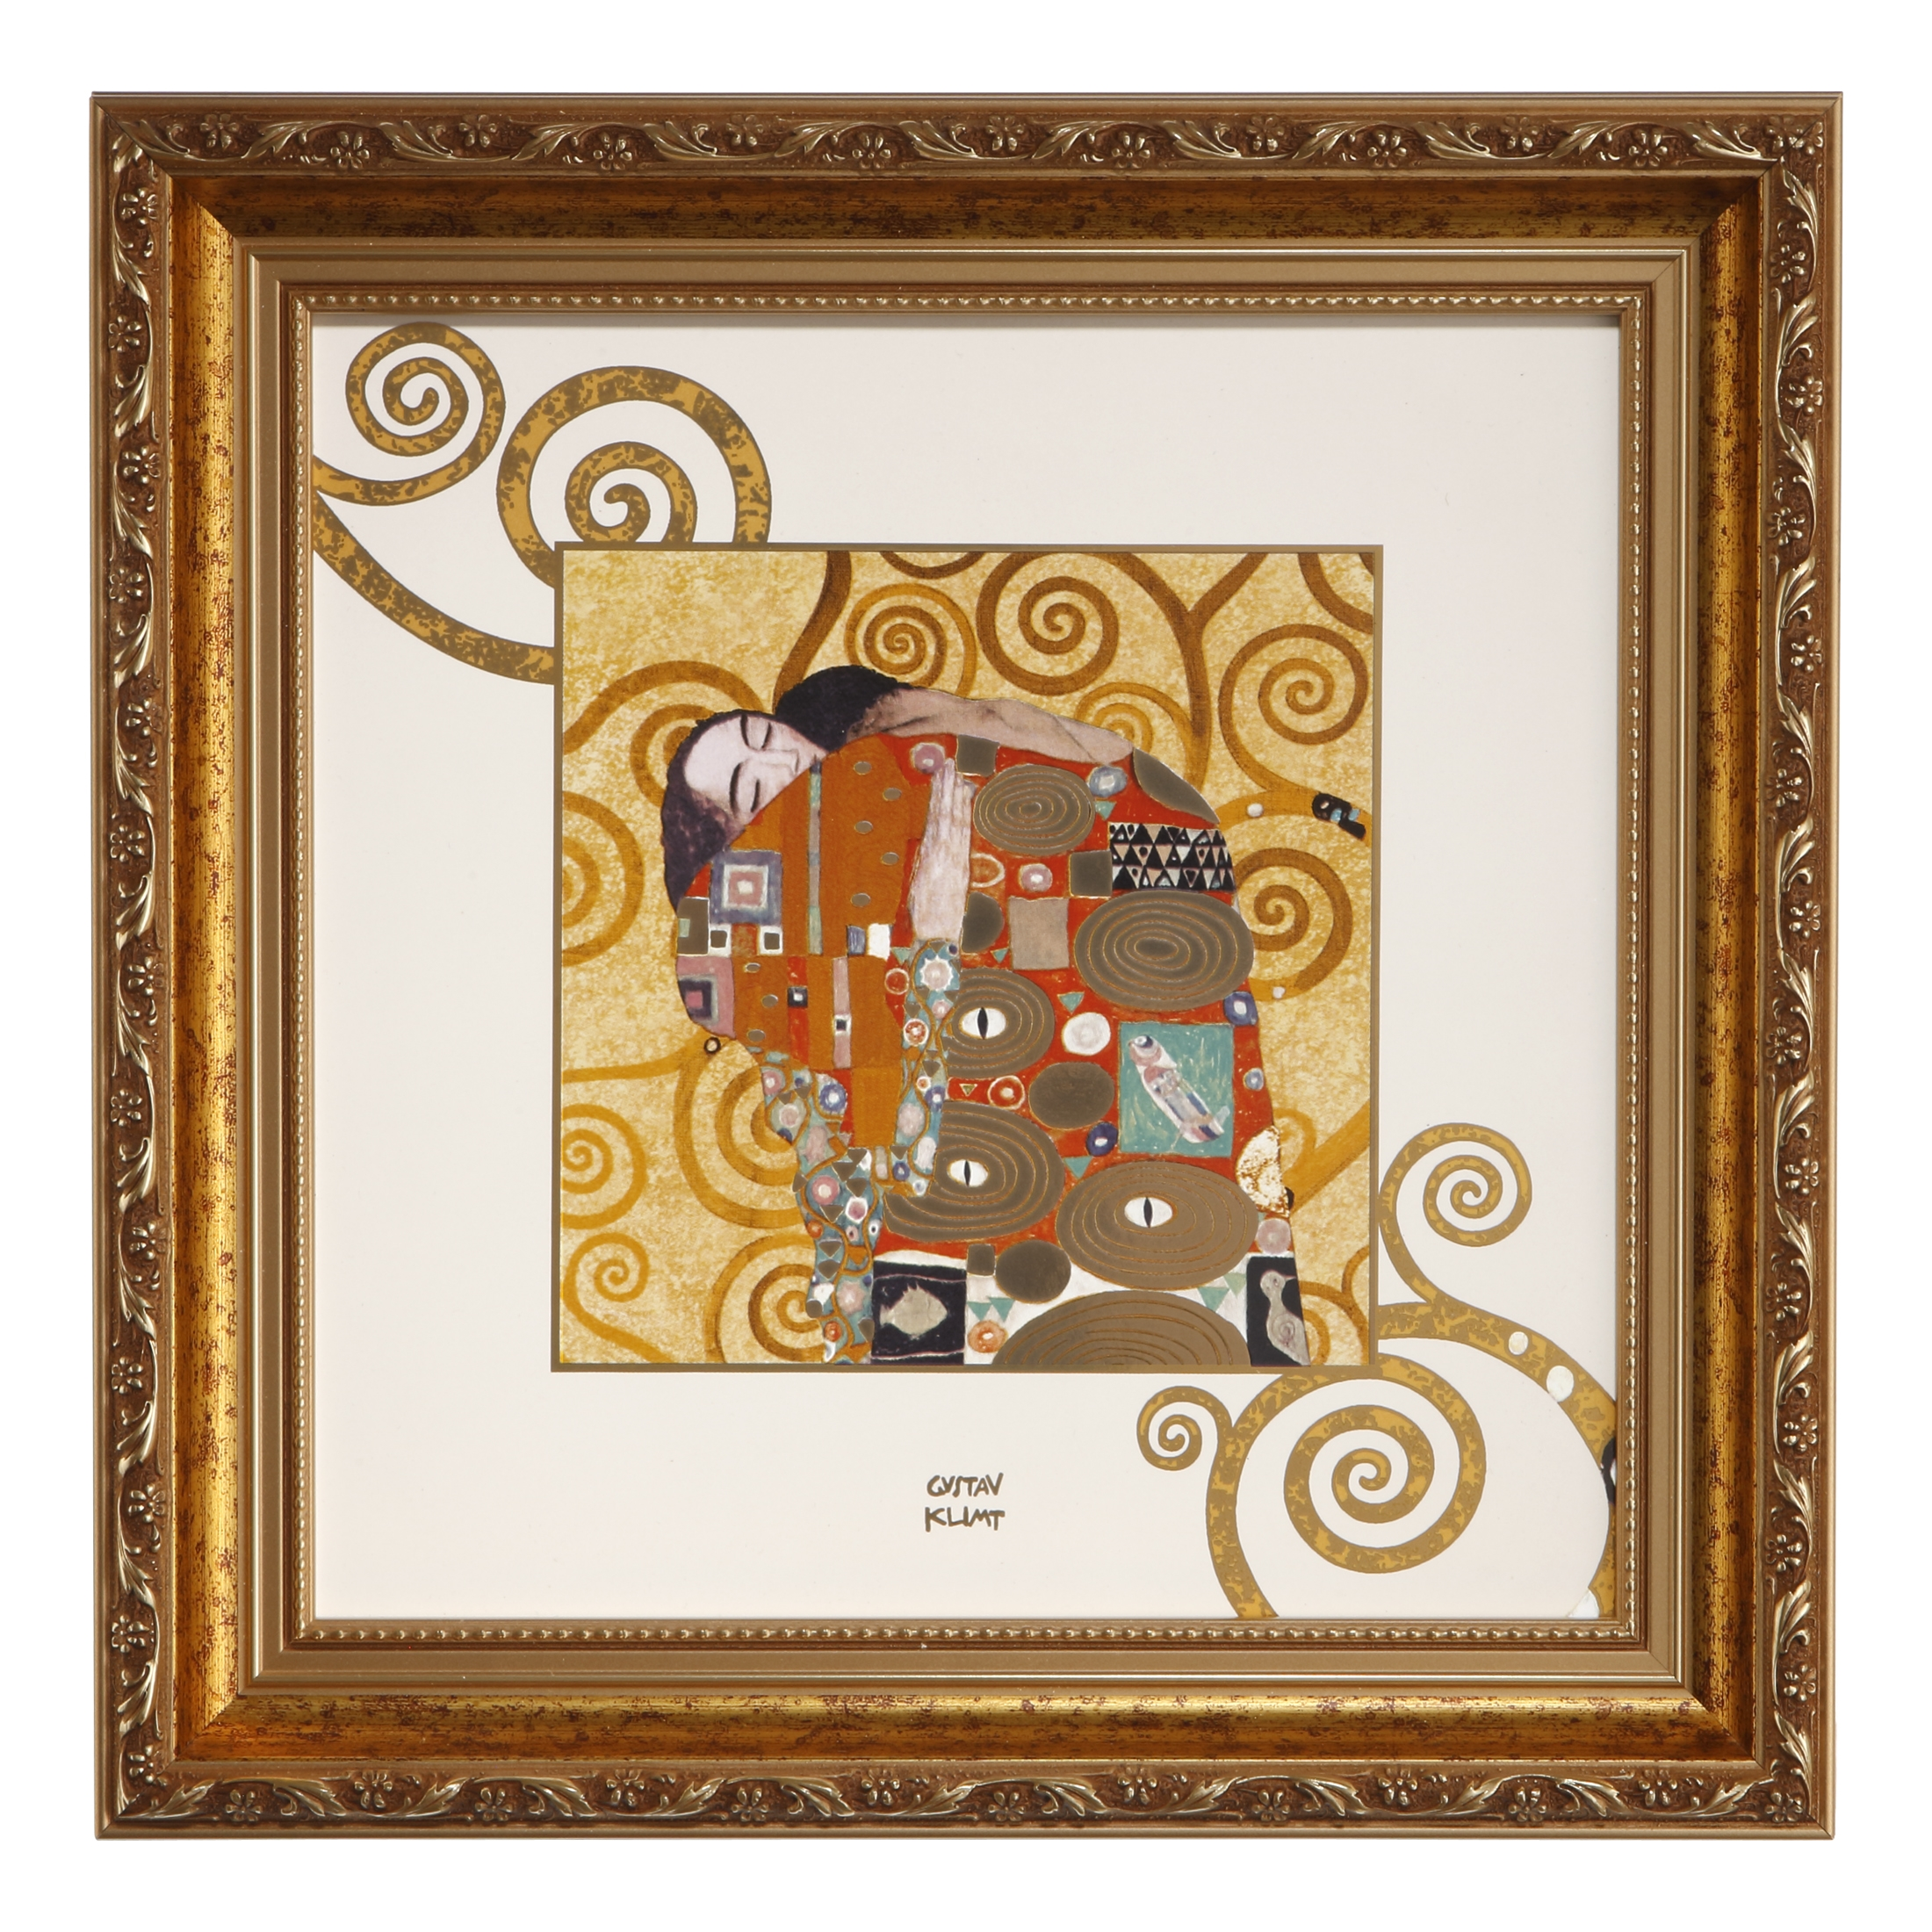 Goebel Artis Orbis Gustav Klimt 'AO P BI Erfüllung' 2021